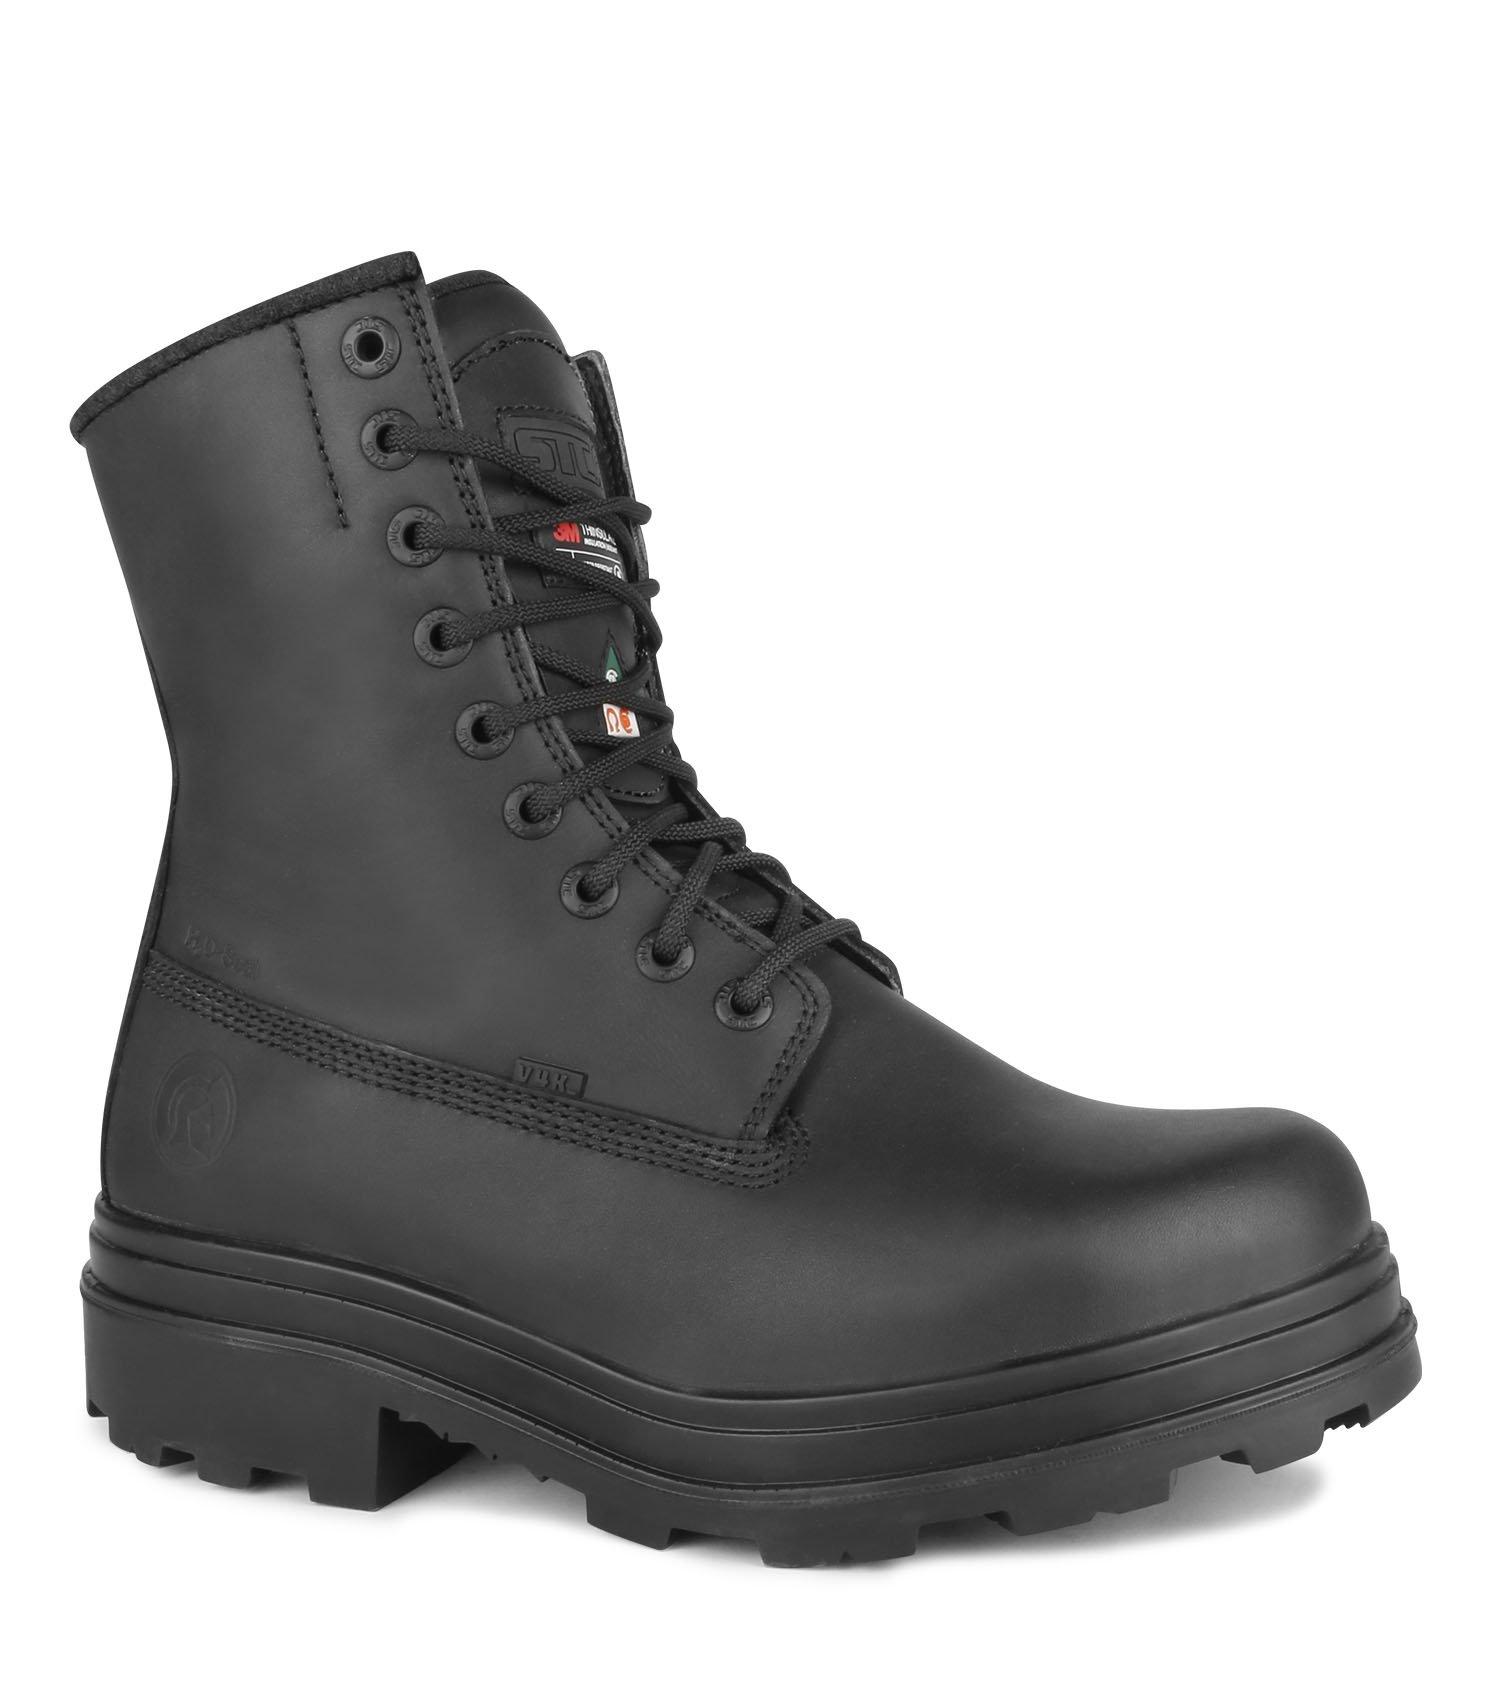 Blitz Boots Black -STC